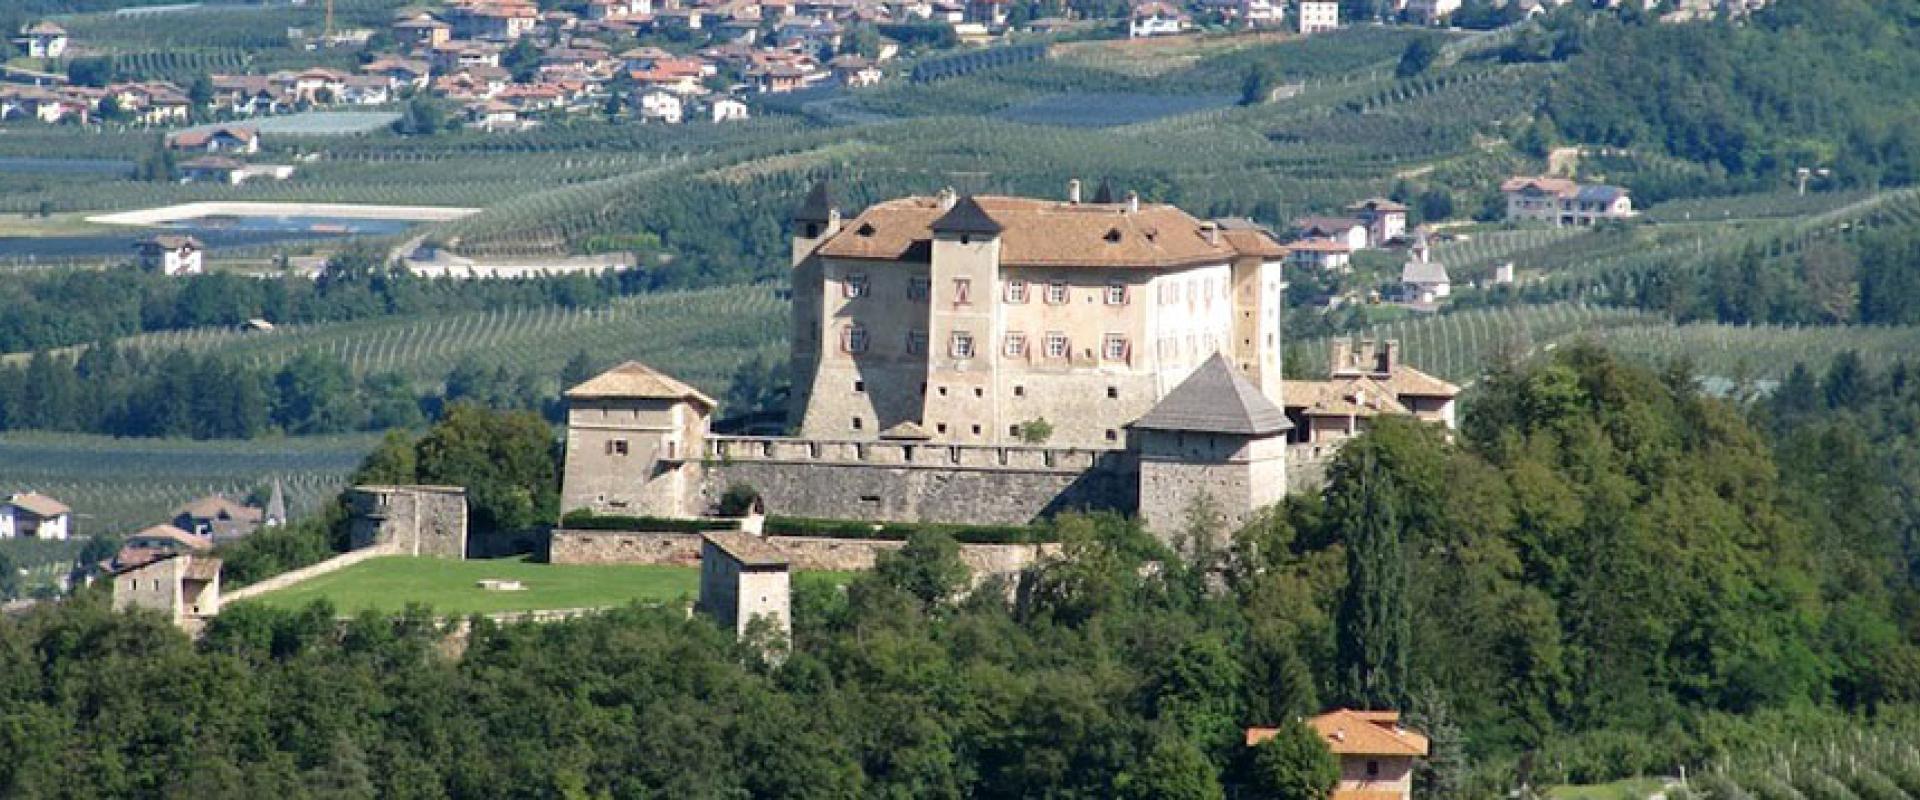 Visit of thun Castle